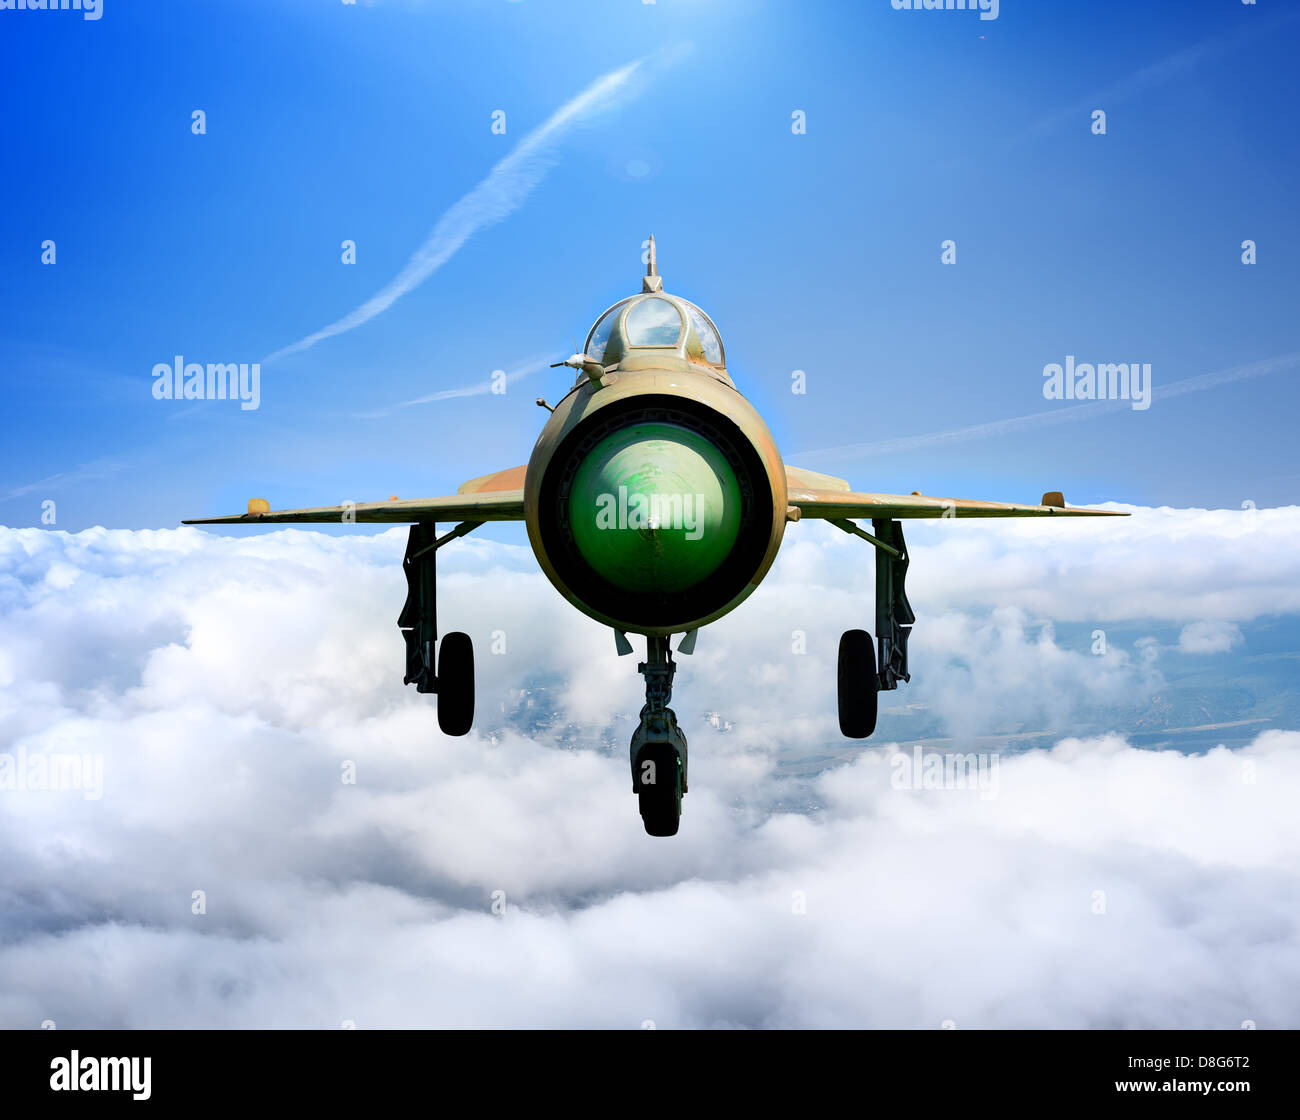 MiG-21 Soviet multipurpose jet plane in flight - Stock Image